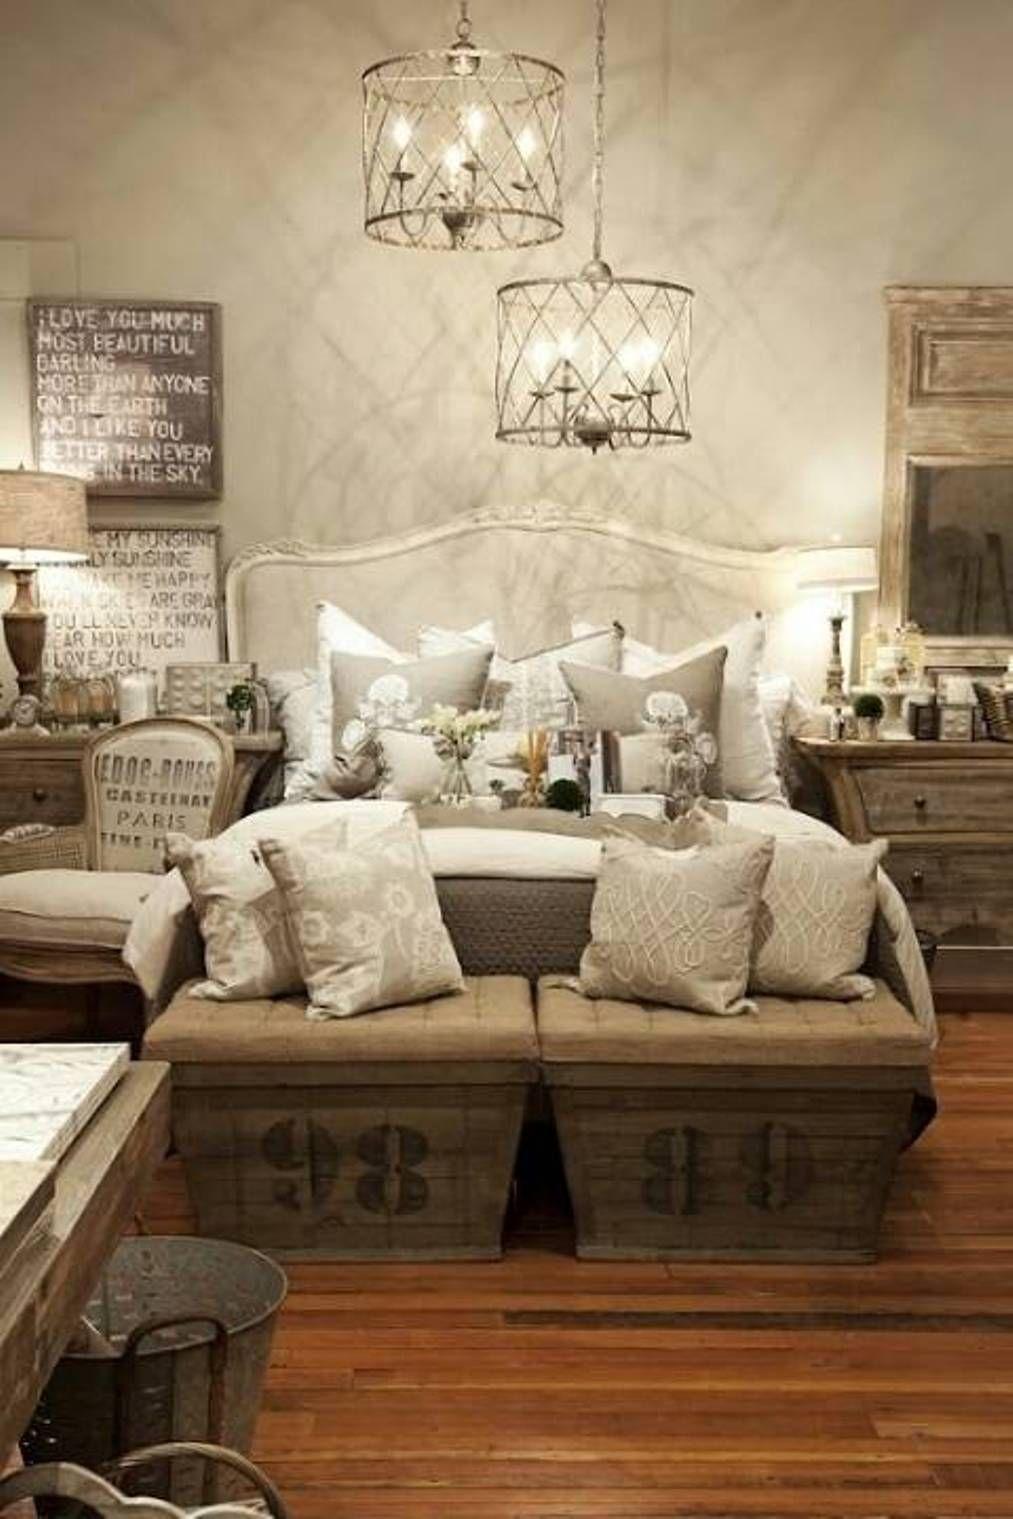 Light Fixtures For Bedrooms | Show Home Design